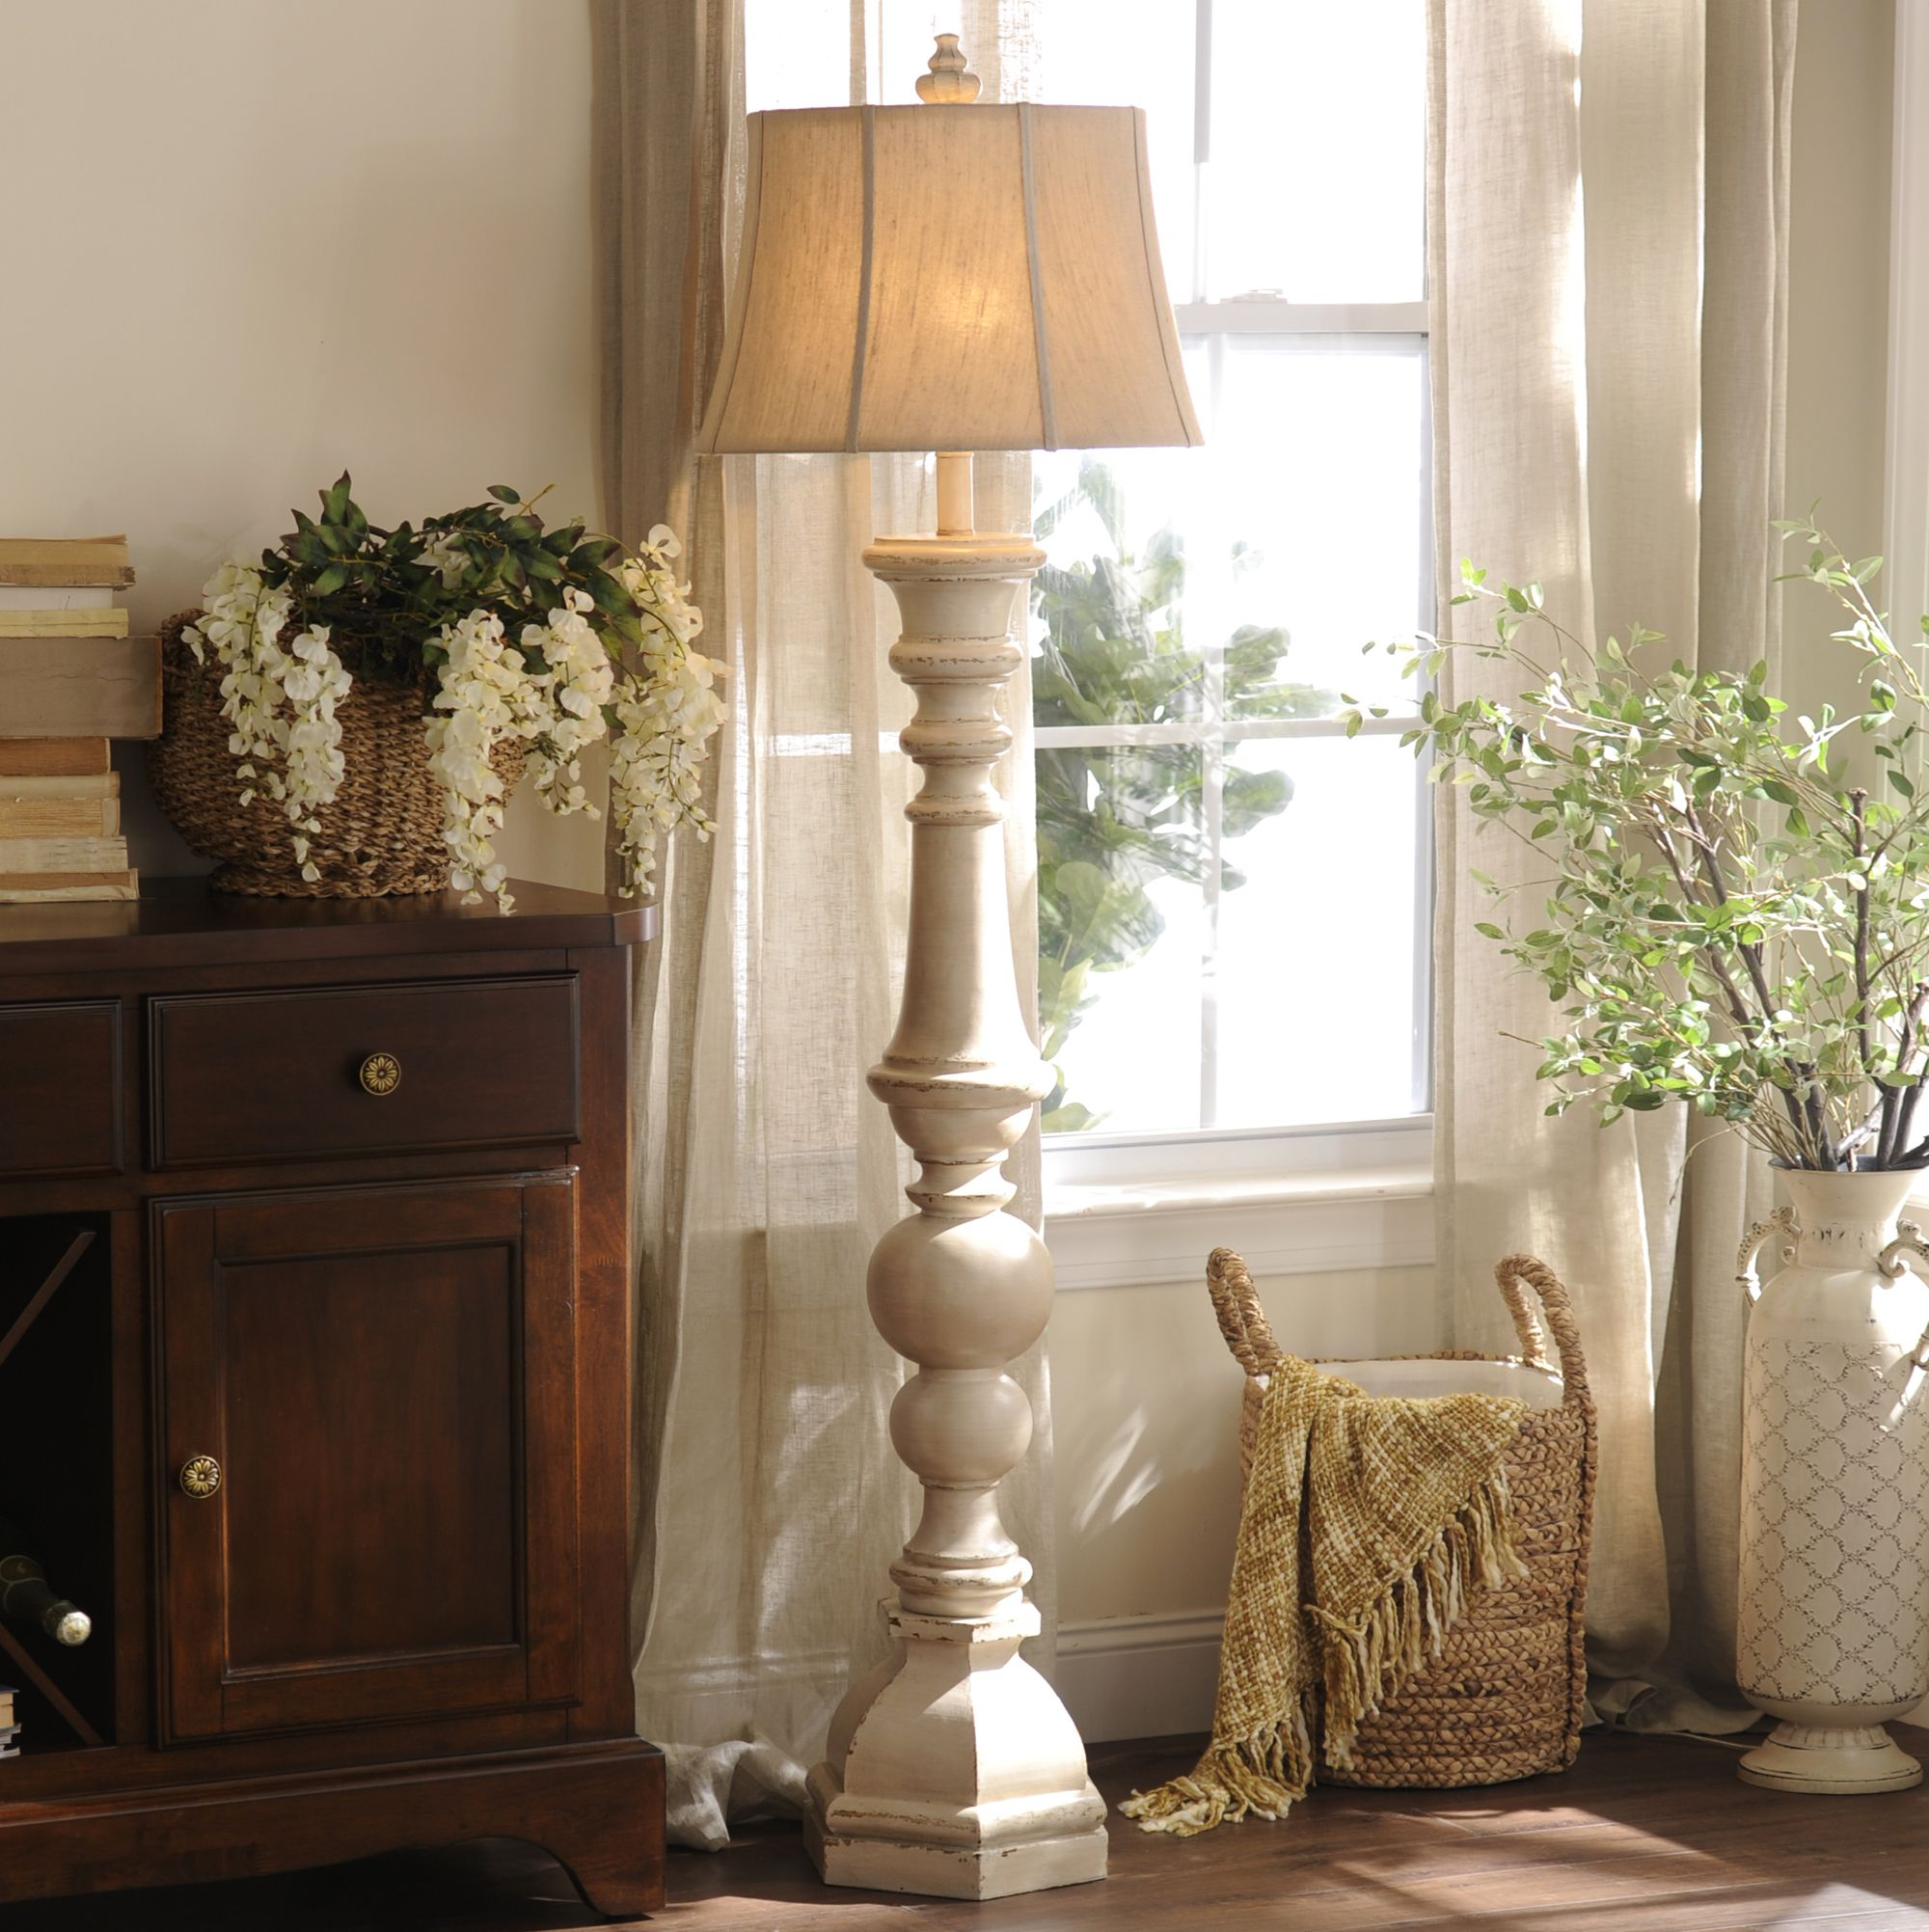 Montage Modern Floor Lamp in 2020 Farmhouse floor lamps